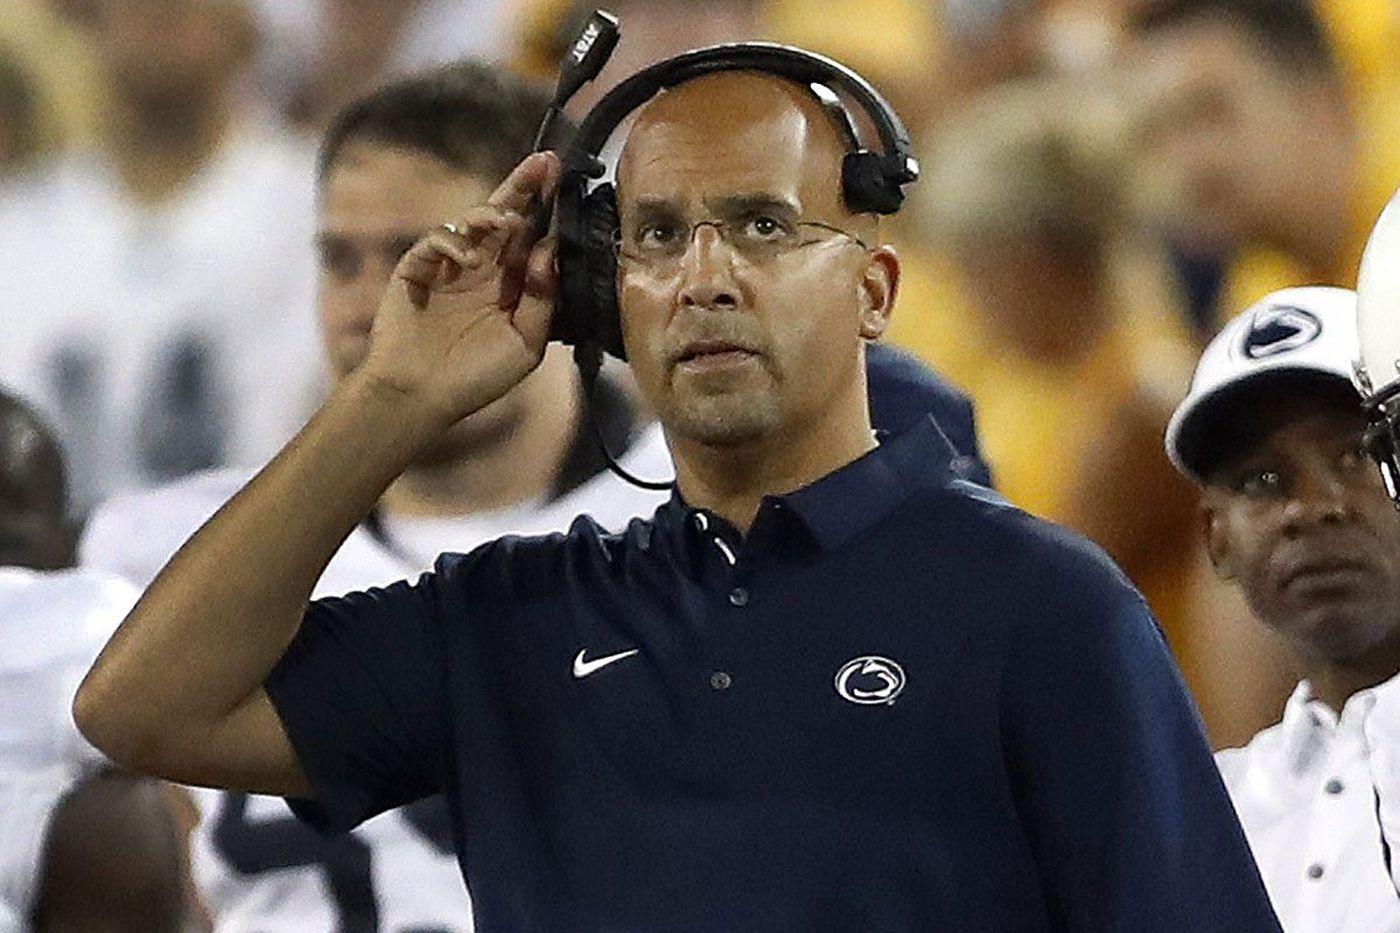 Franklin: Penn State seeks improvement on offensive line, field goal kicking